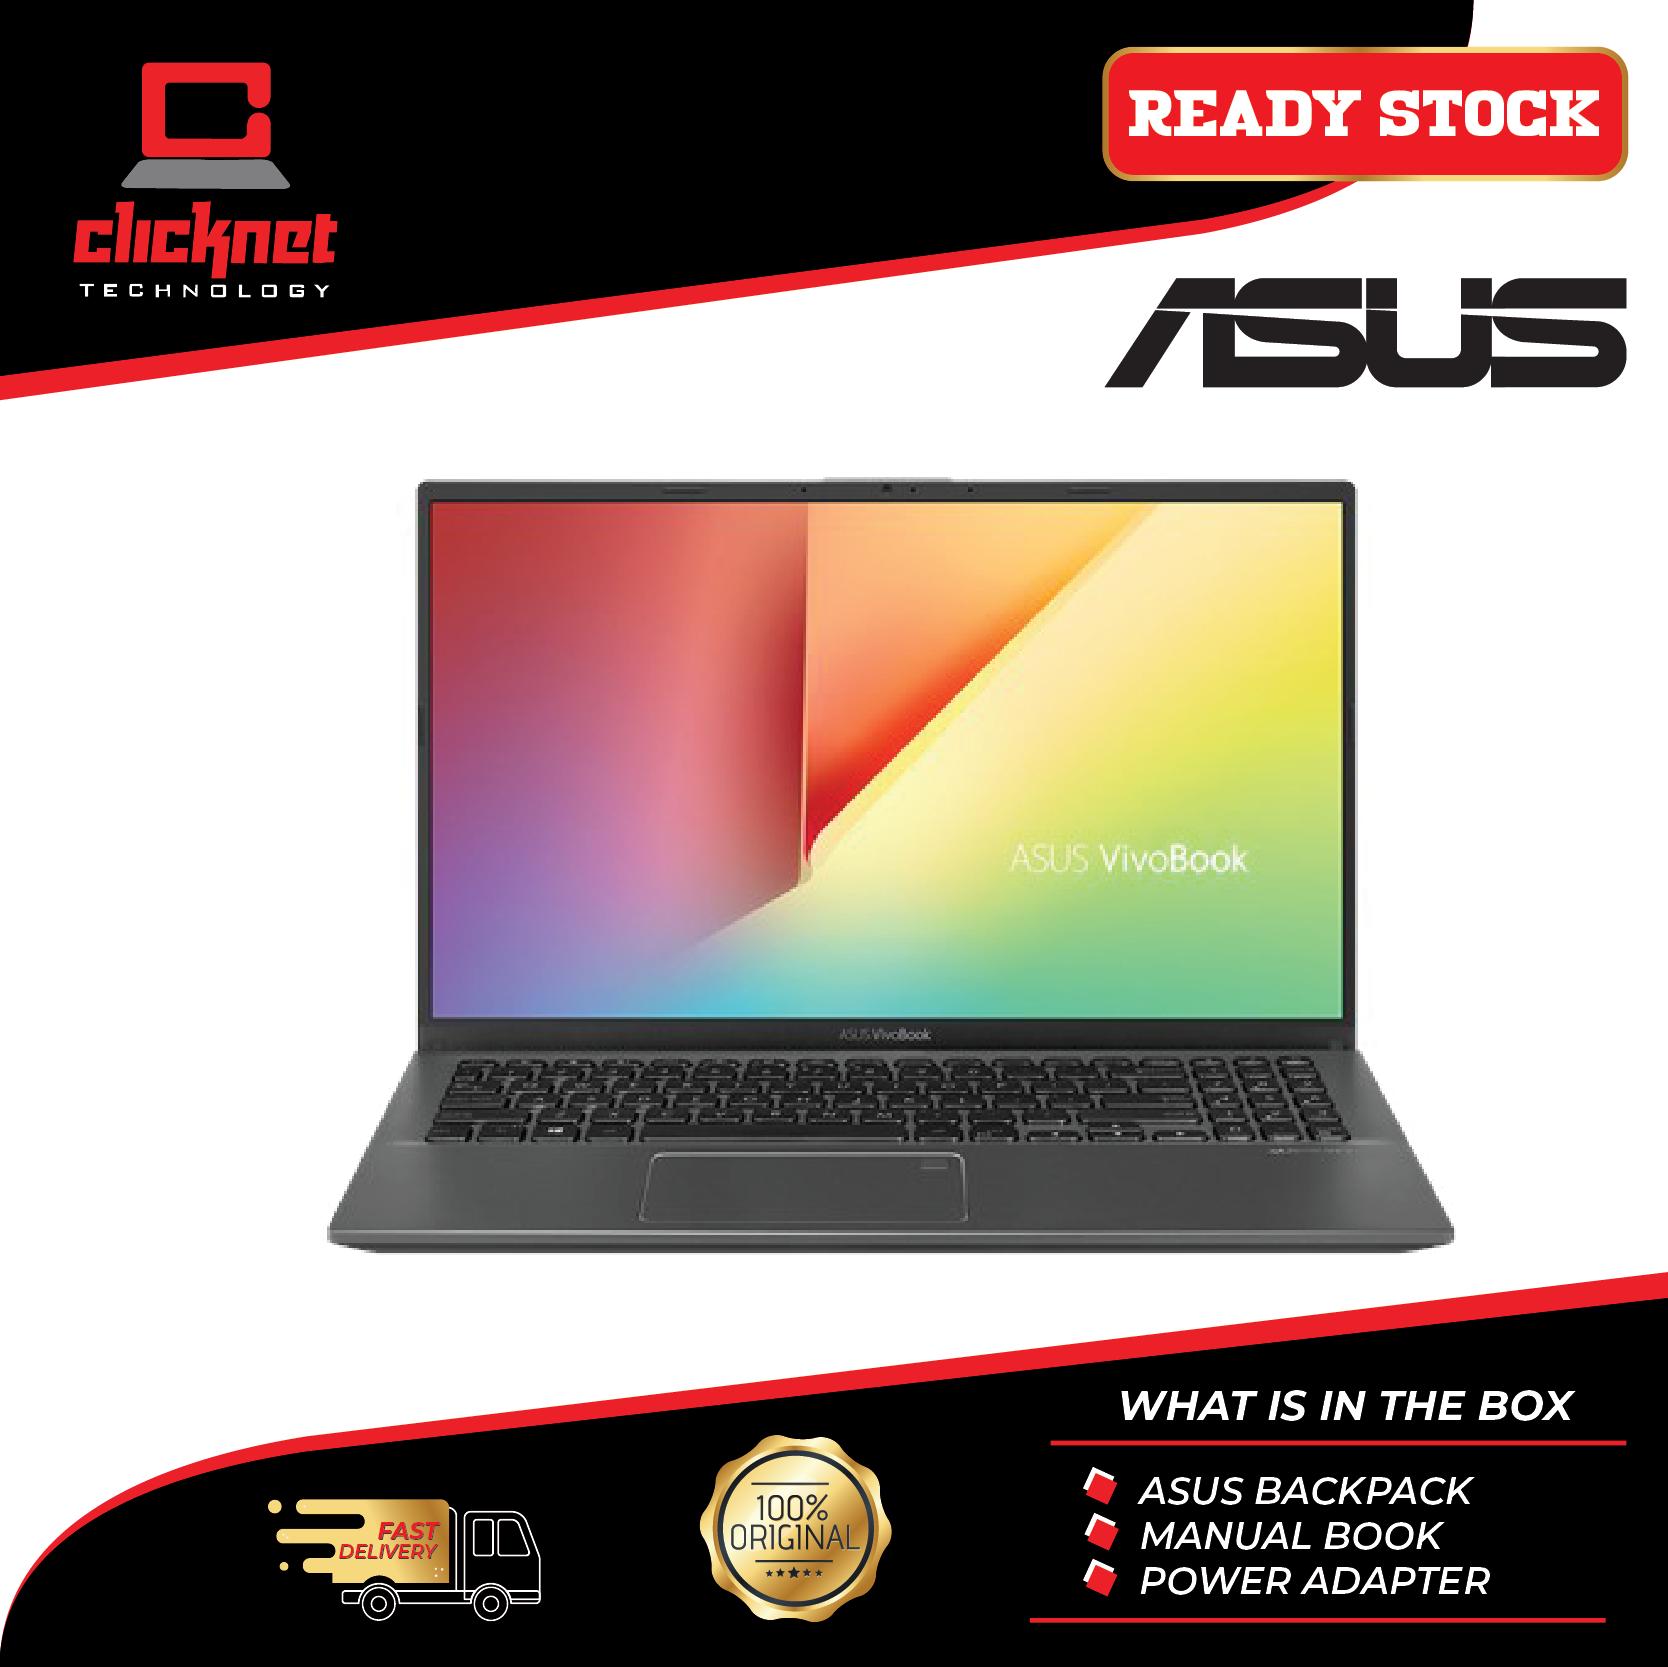 Asus Vivobook A512F-LBQ176T 15.6  FHD Laptop Grey (i5-8265U 4GB 512GB SSD NV MX250 2GB 15.6FHD W10) Malaysia